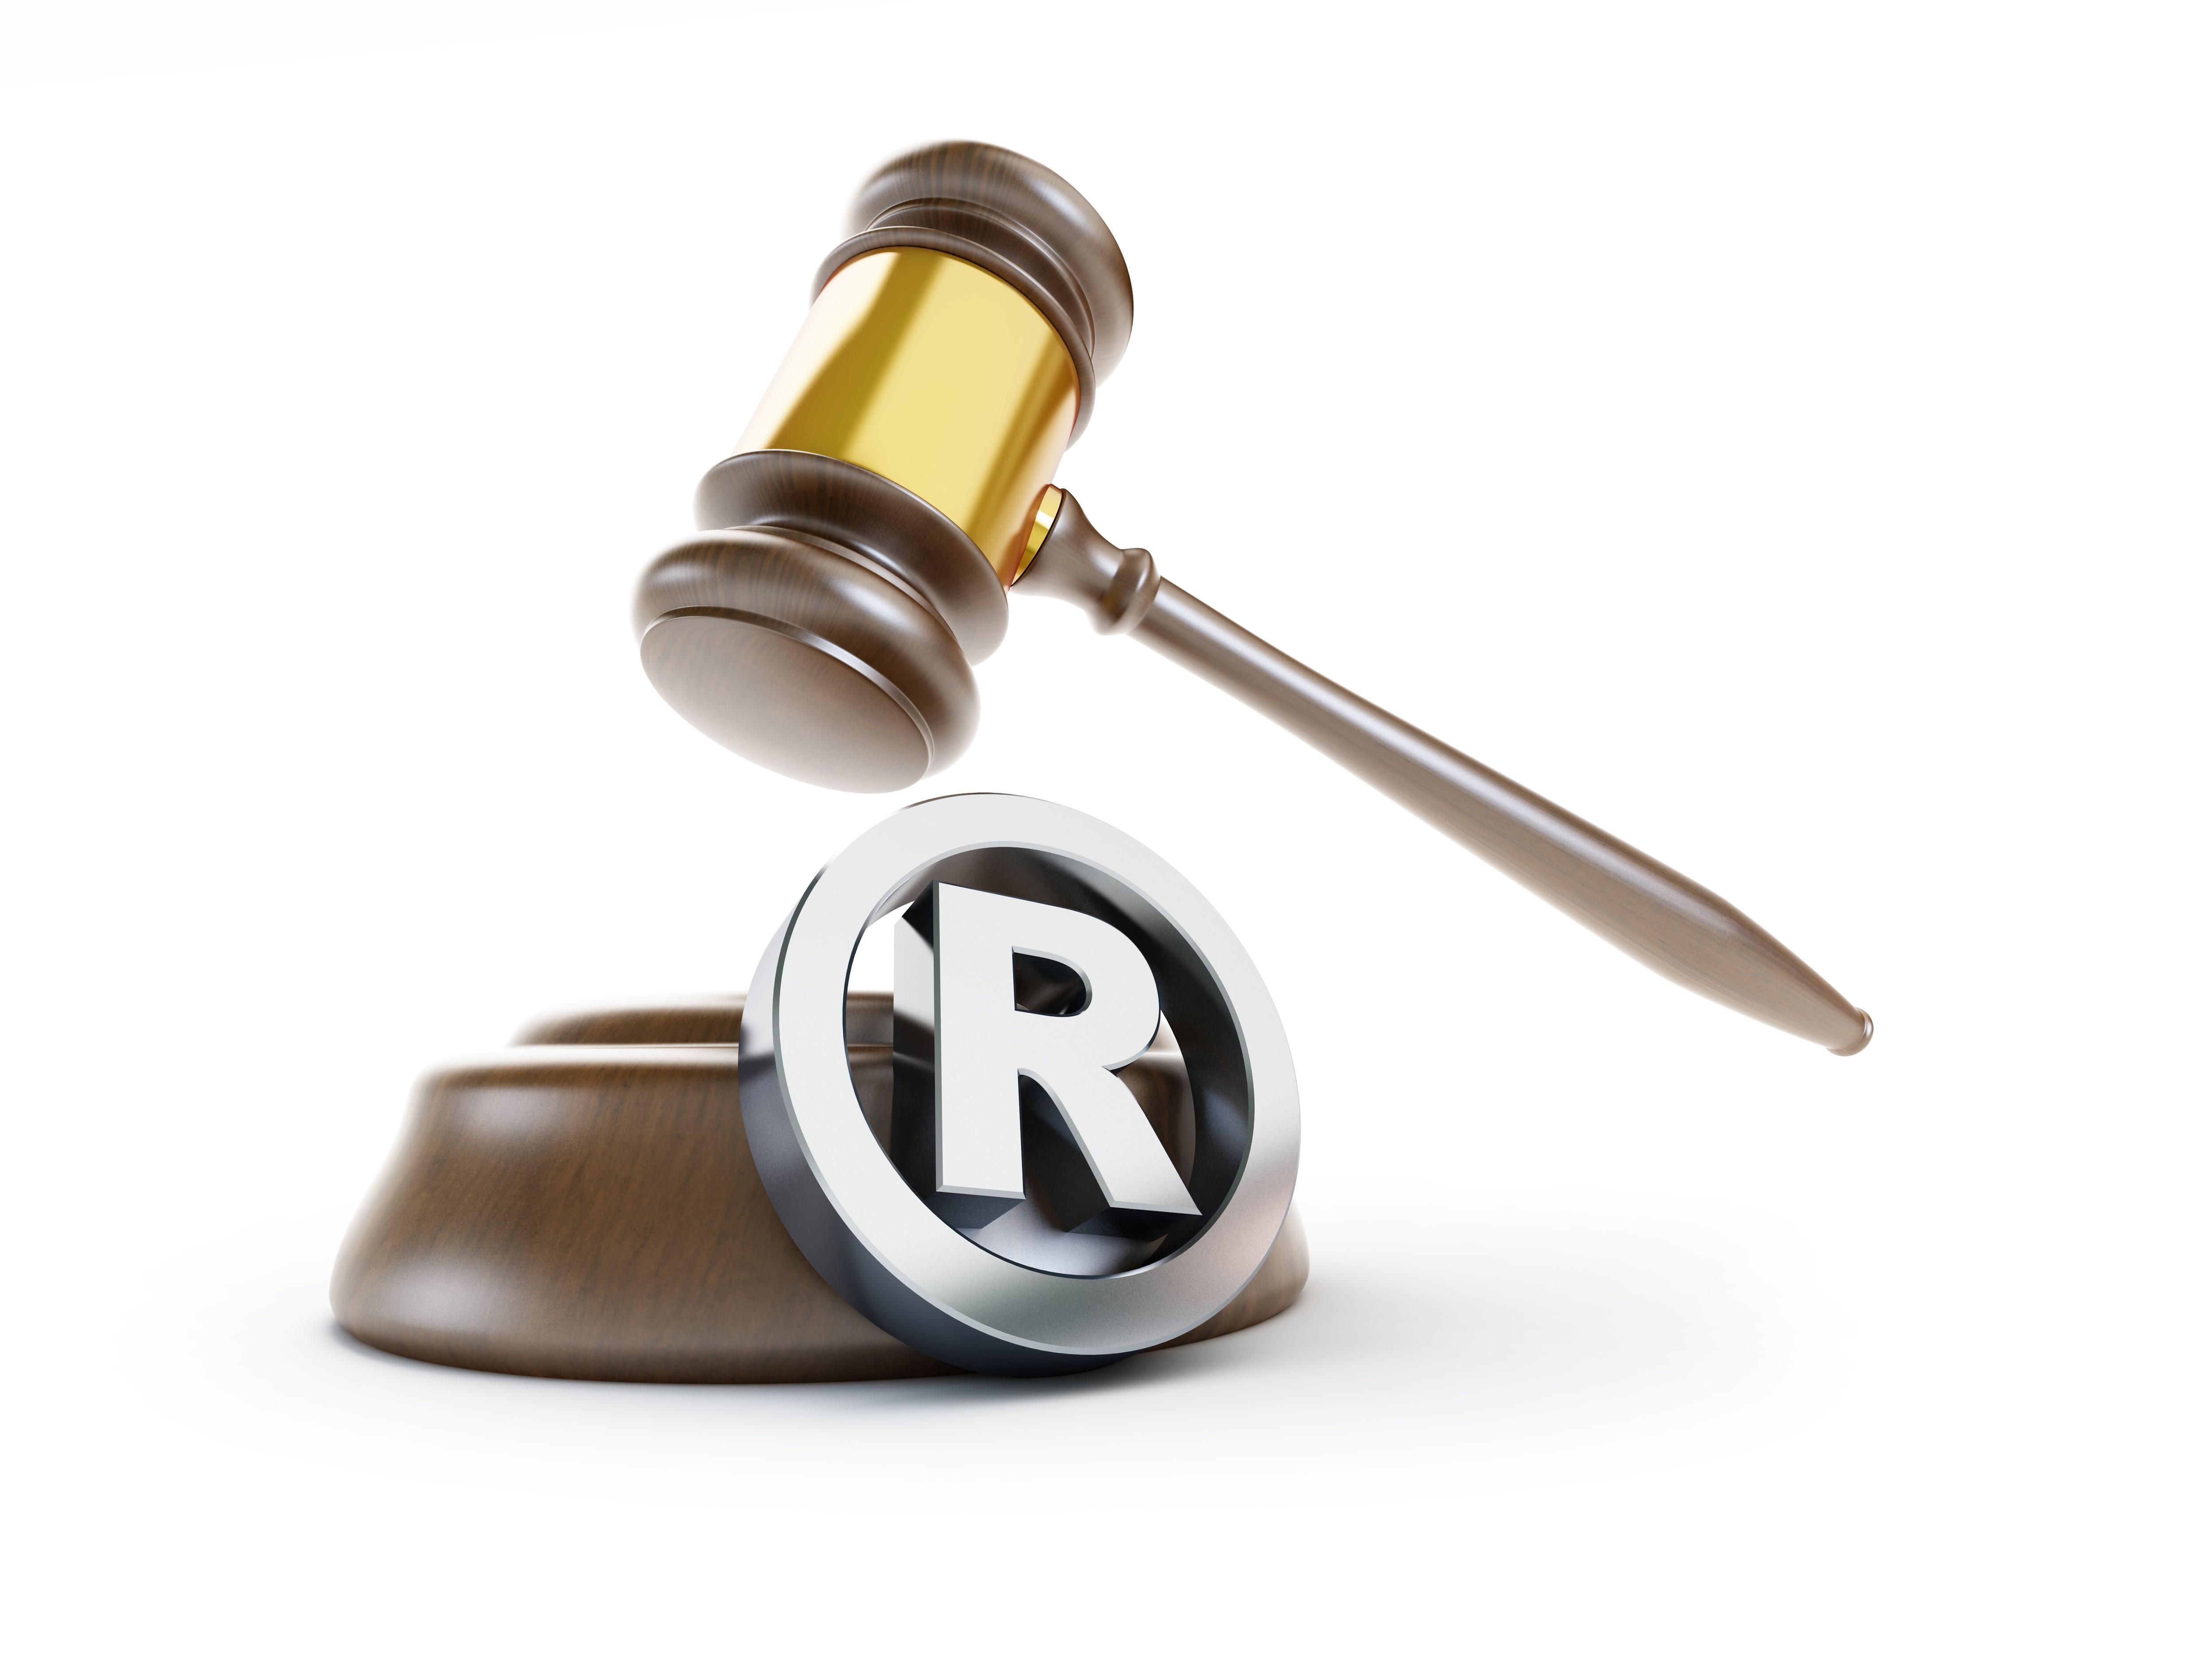 law-r-copyright-trademark.jpg